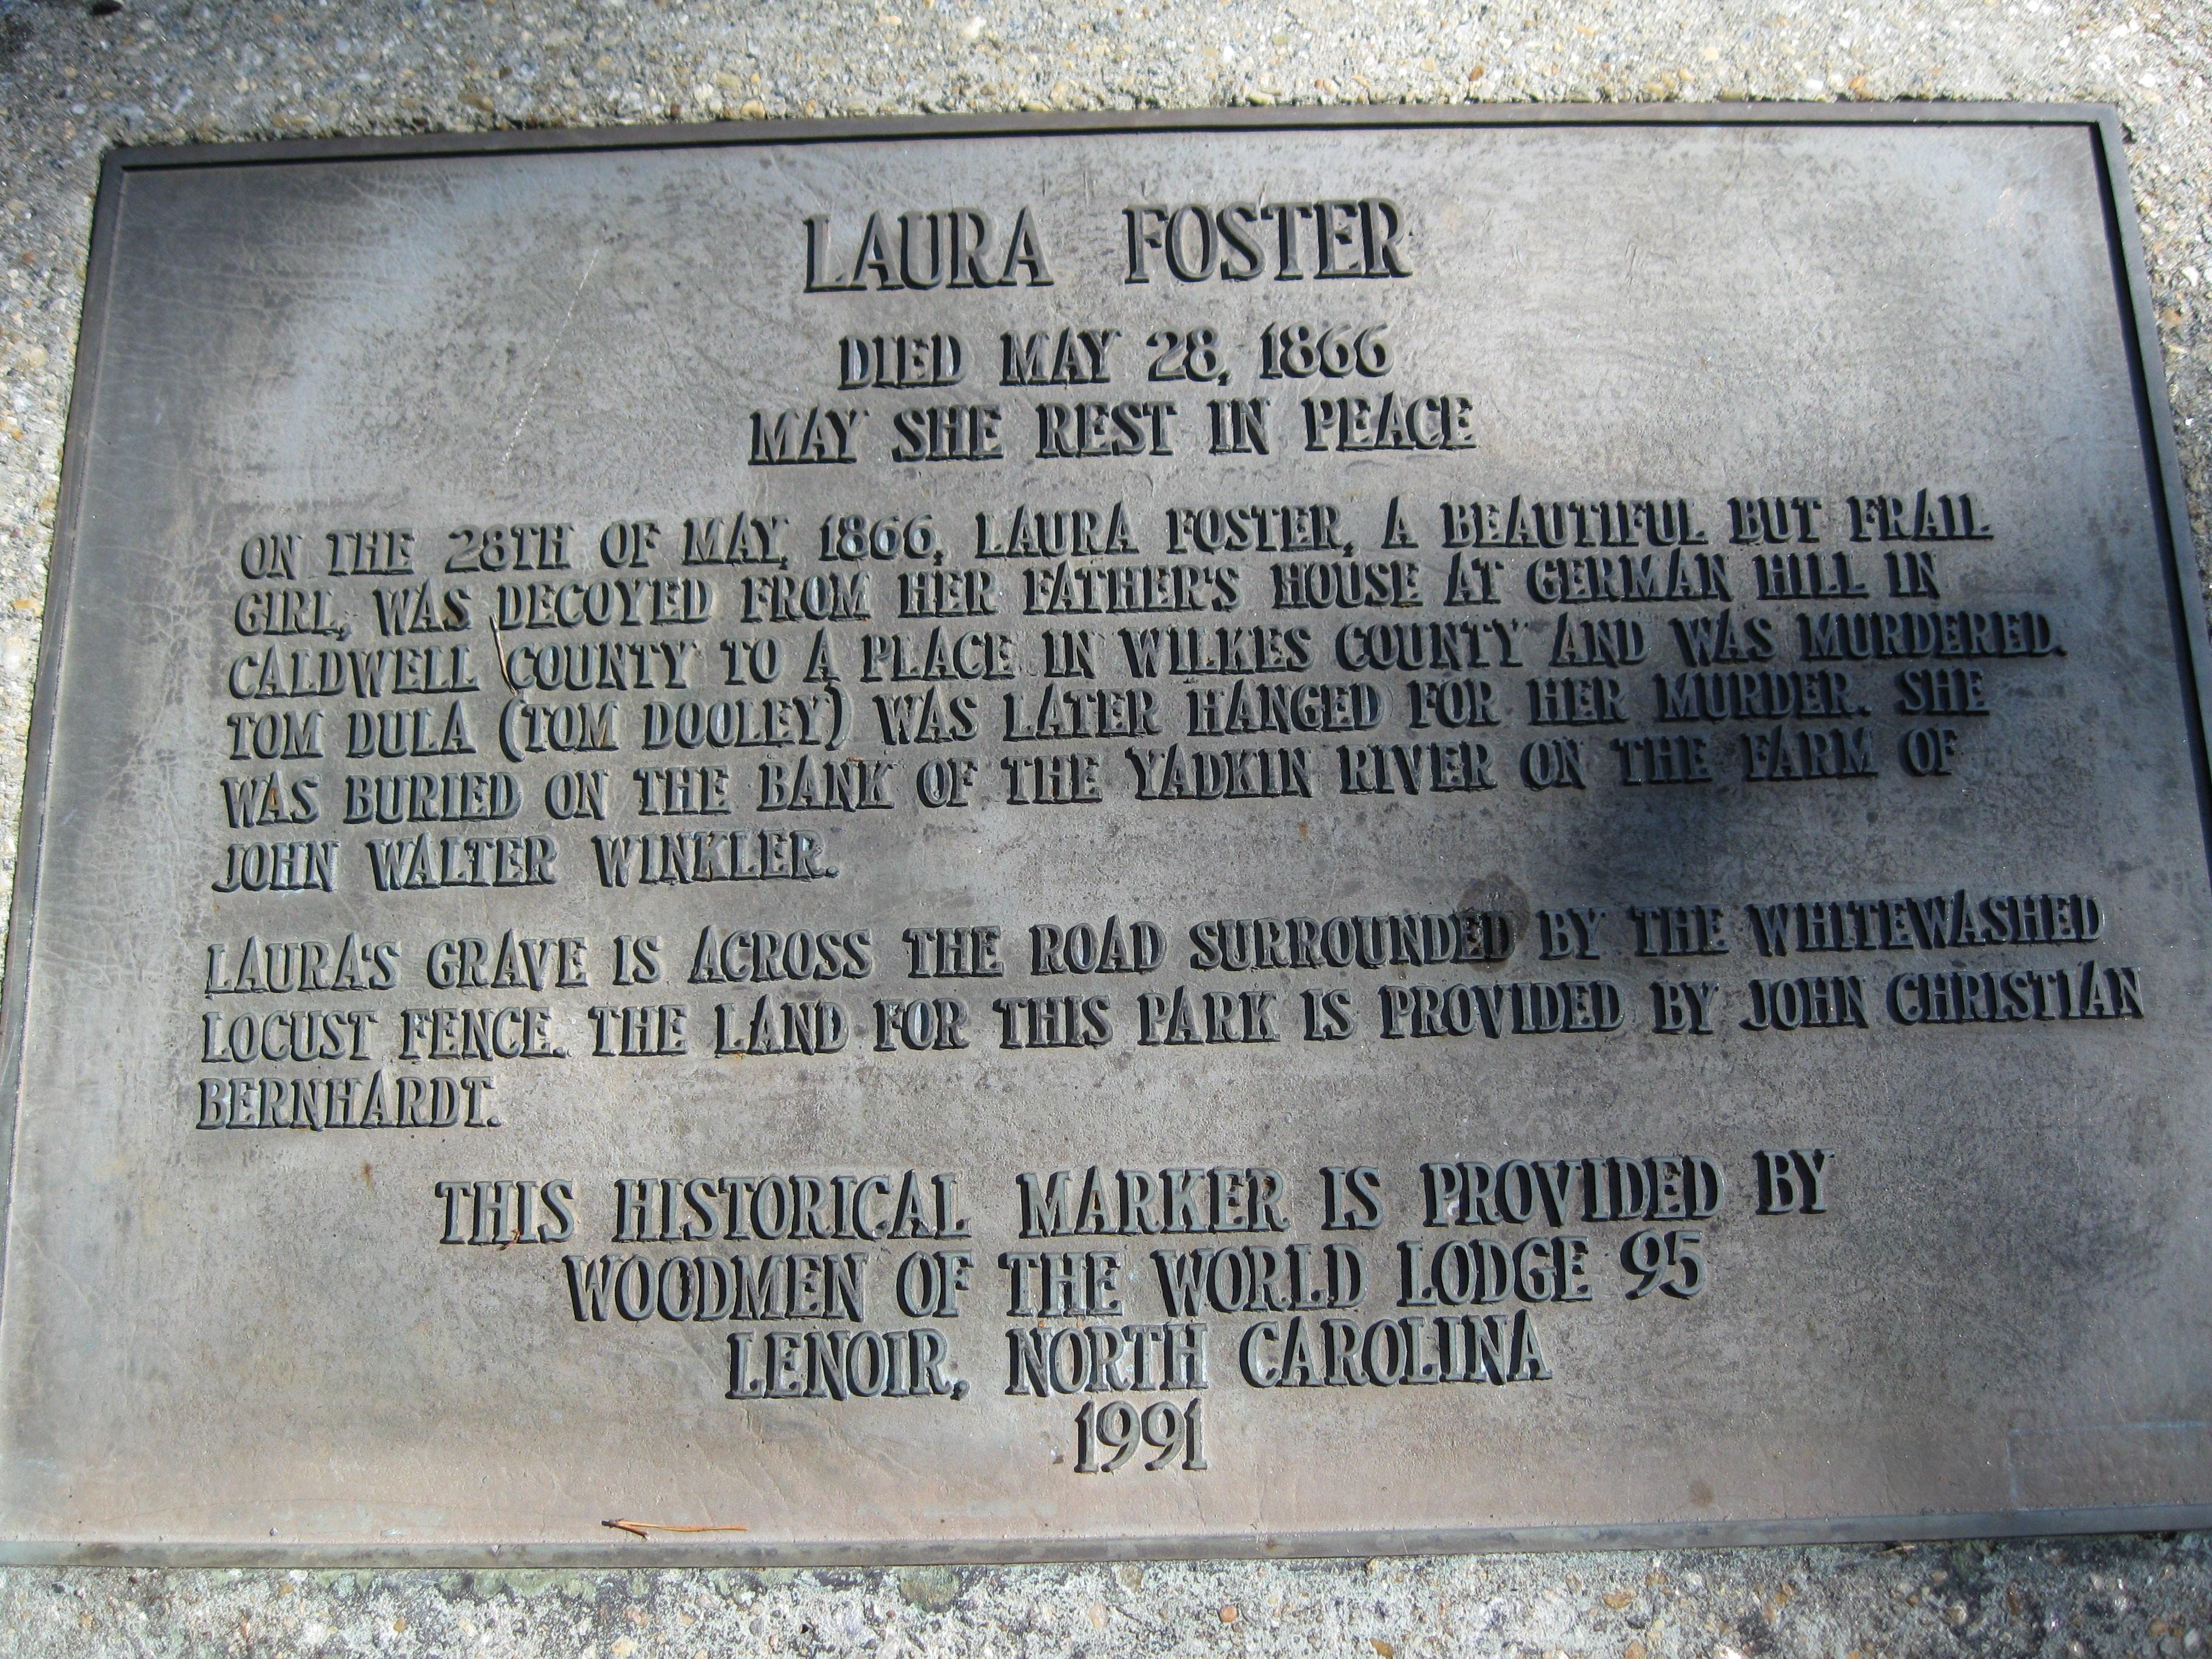 Laura Foster's Historic Marker